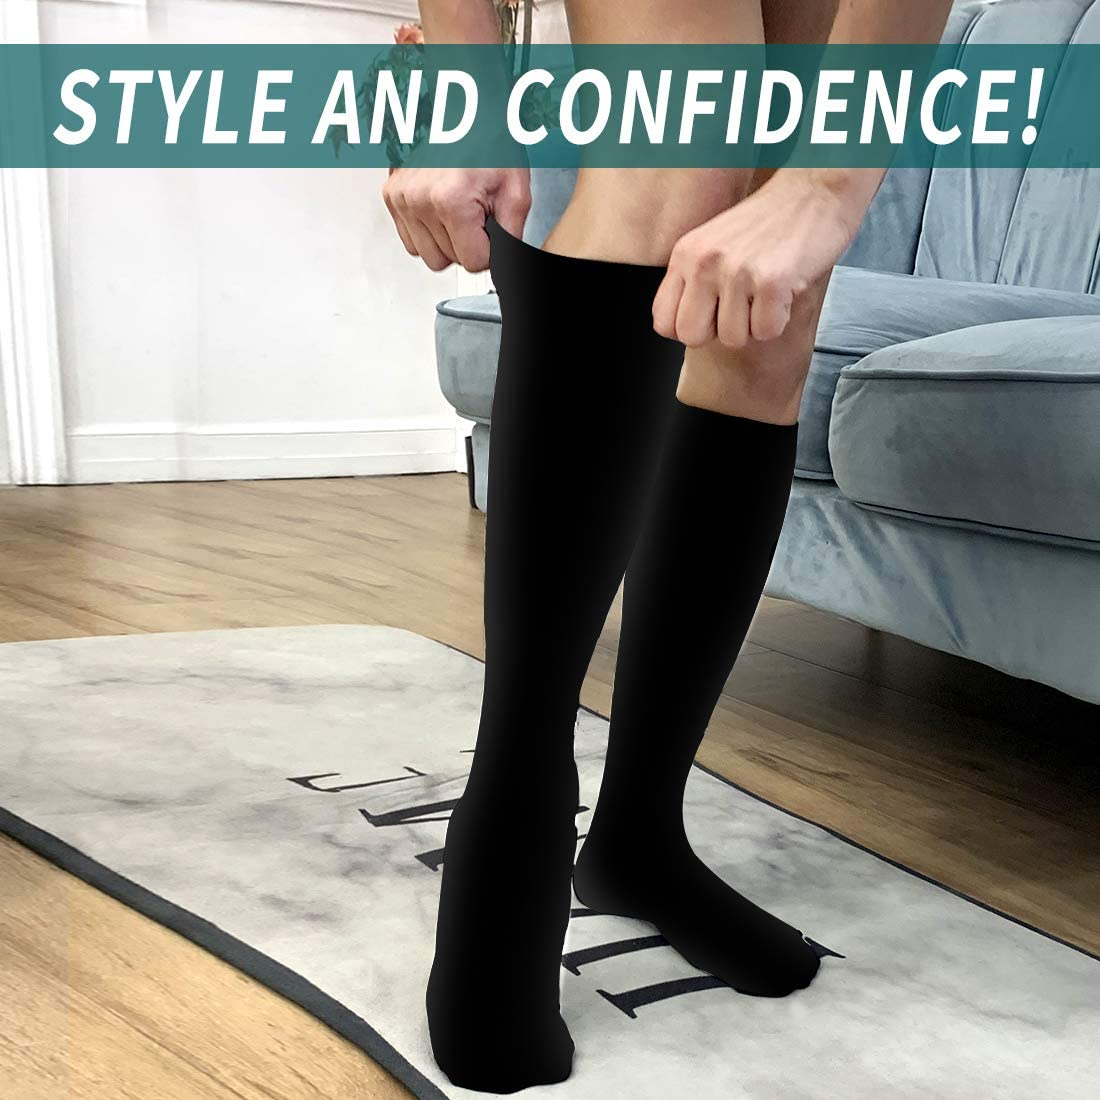 Compression Socks Women and Men-Best for Running,Athletic,Varicose Veins,Nursing,Hiking,Recovery /& Flight Socks